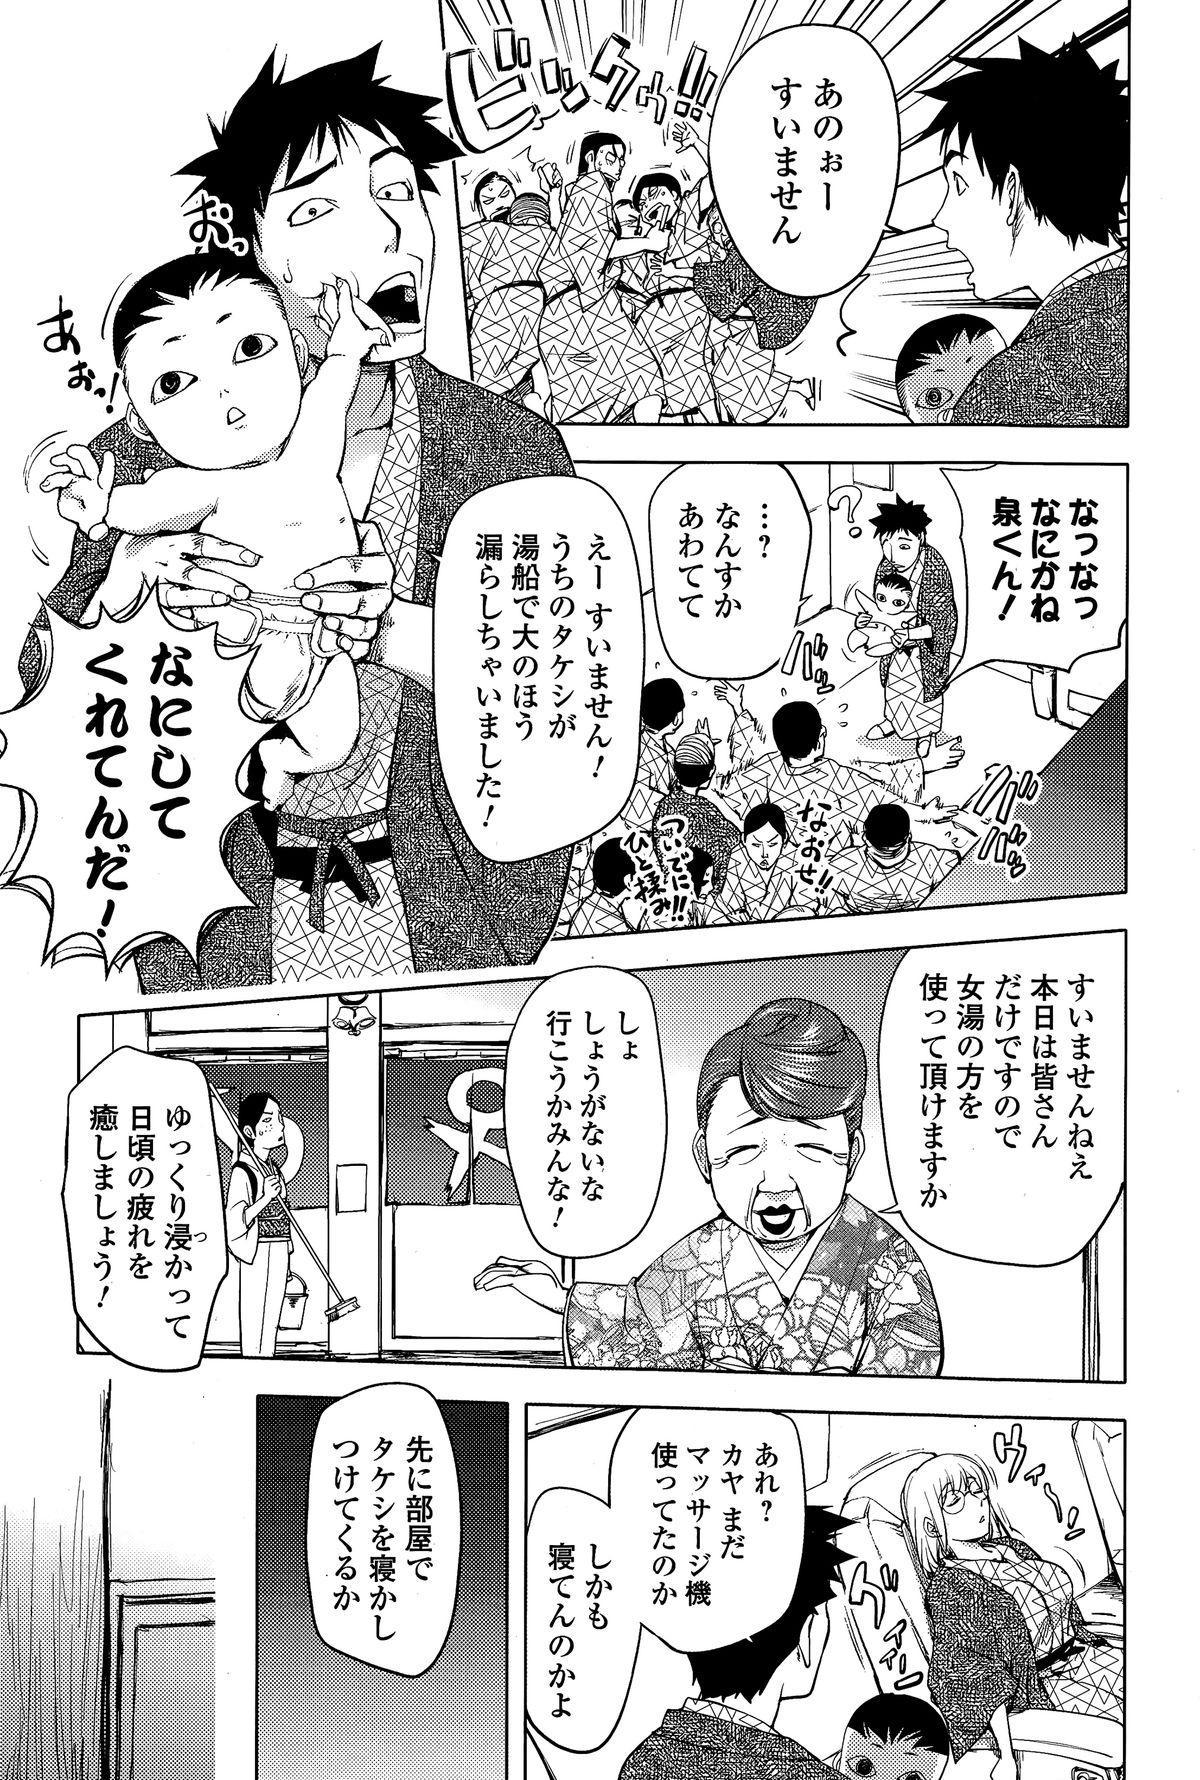 Comic Toutetsu 2015-02 Vol. 3 84